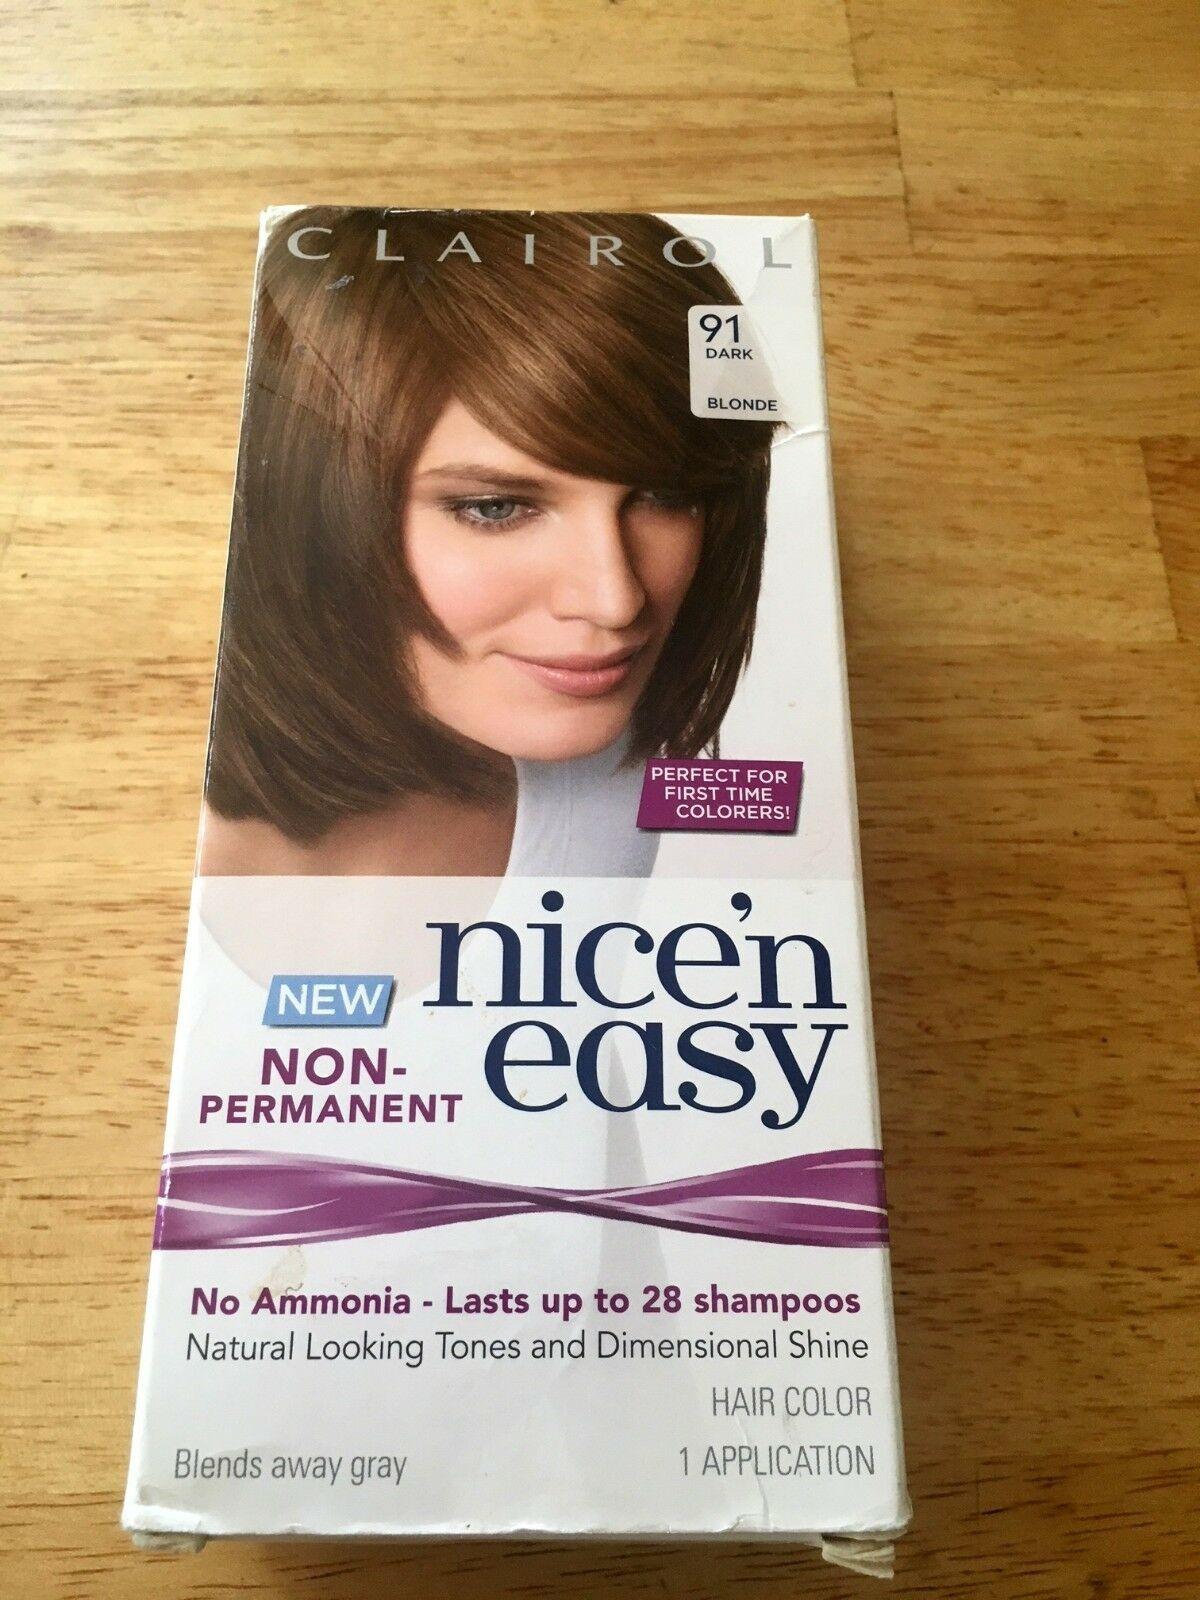 Clairol Nice 'N Easy Non-Permanent Hair Color 91 Dark Blonde